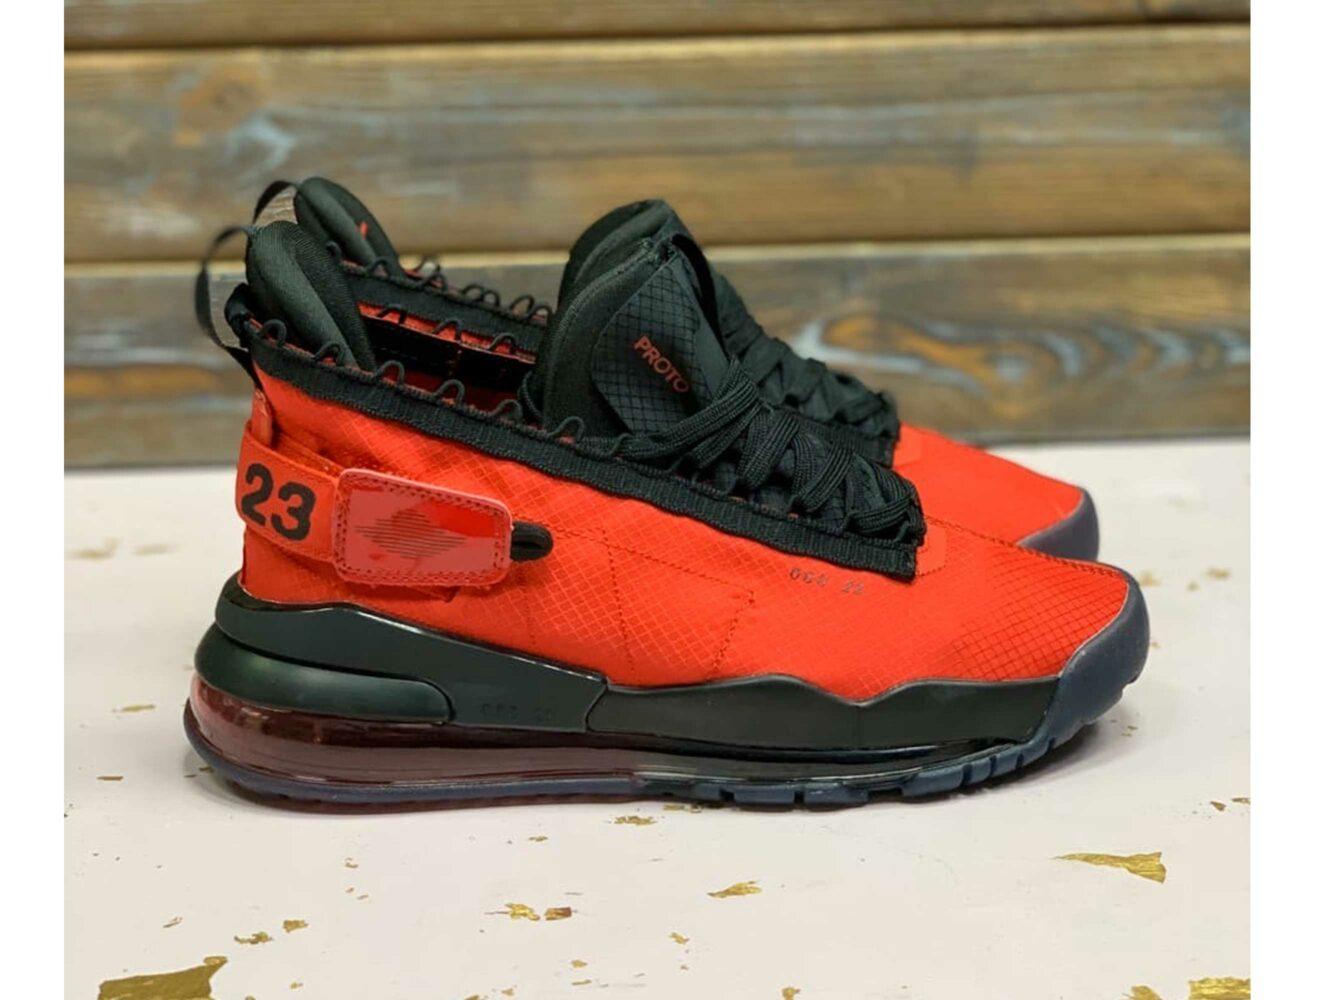 Jordan proto max 720 red black BQ6623_600 купить